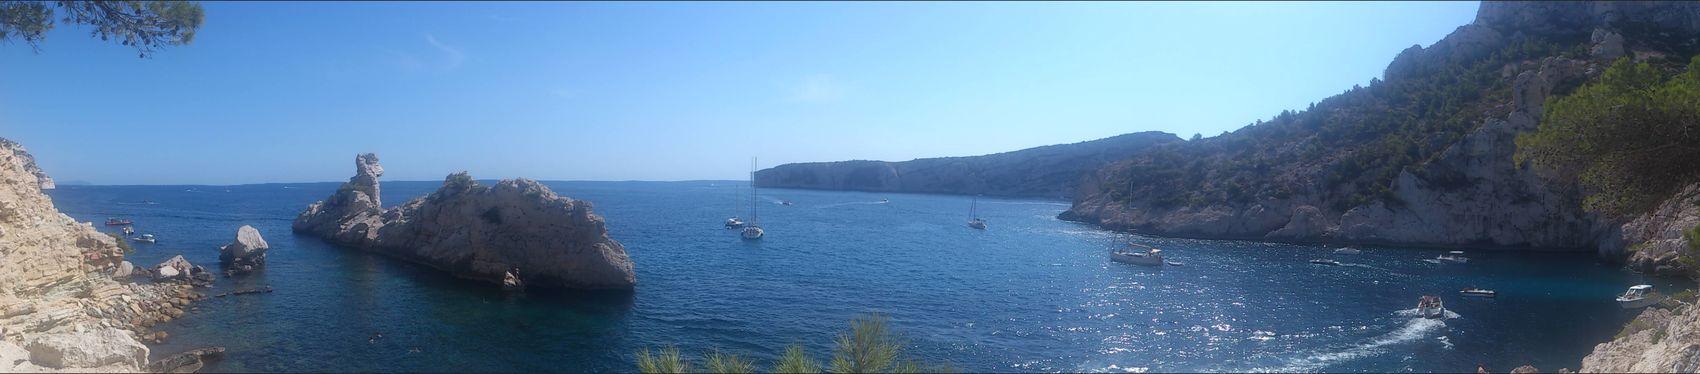 calanque de Sugiton Calanques  Sugiton Marseille Water_collection